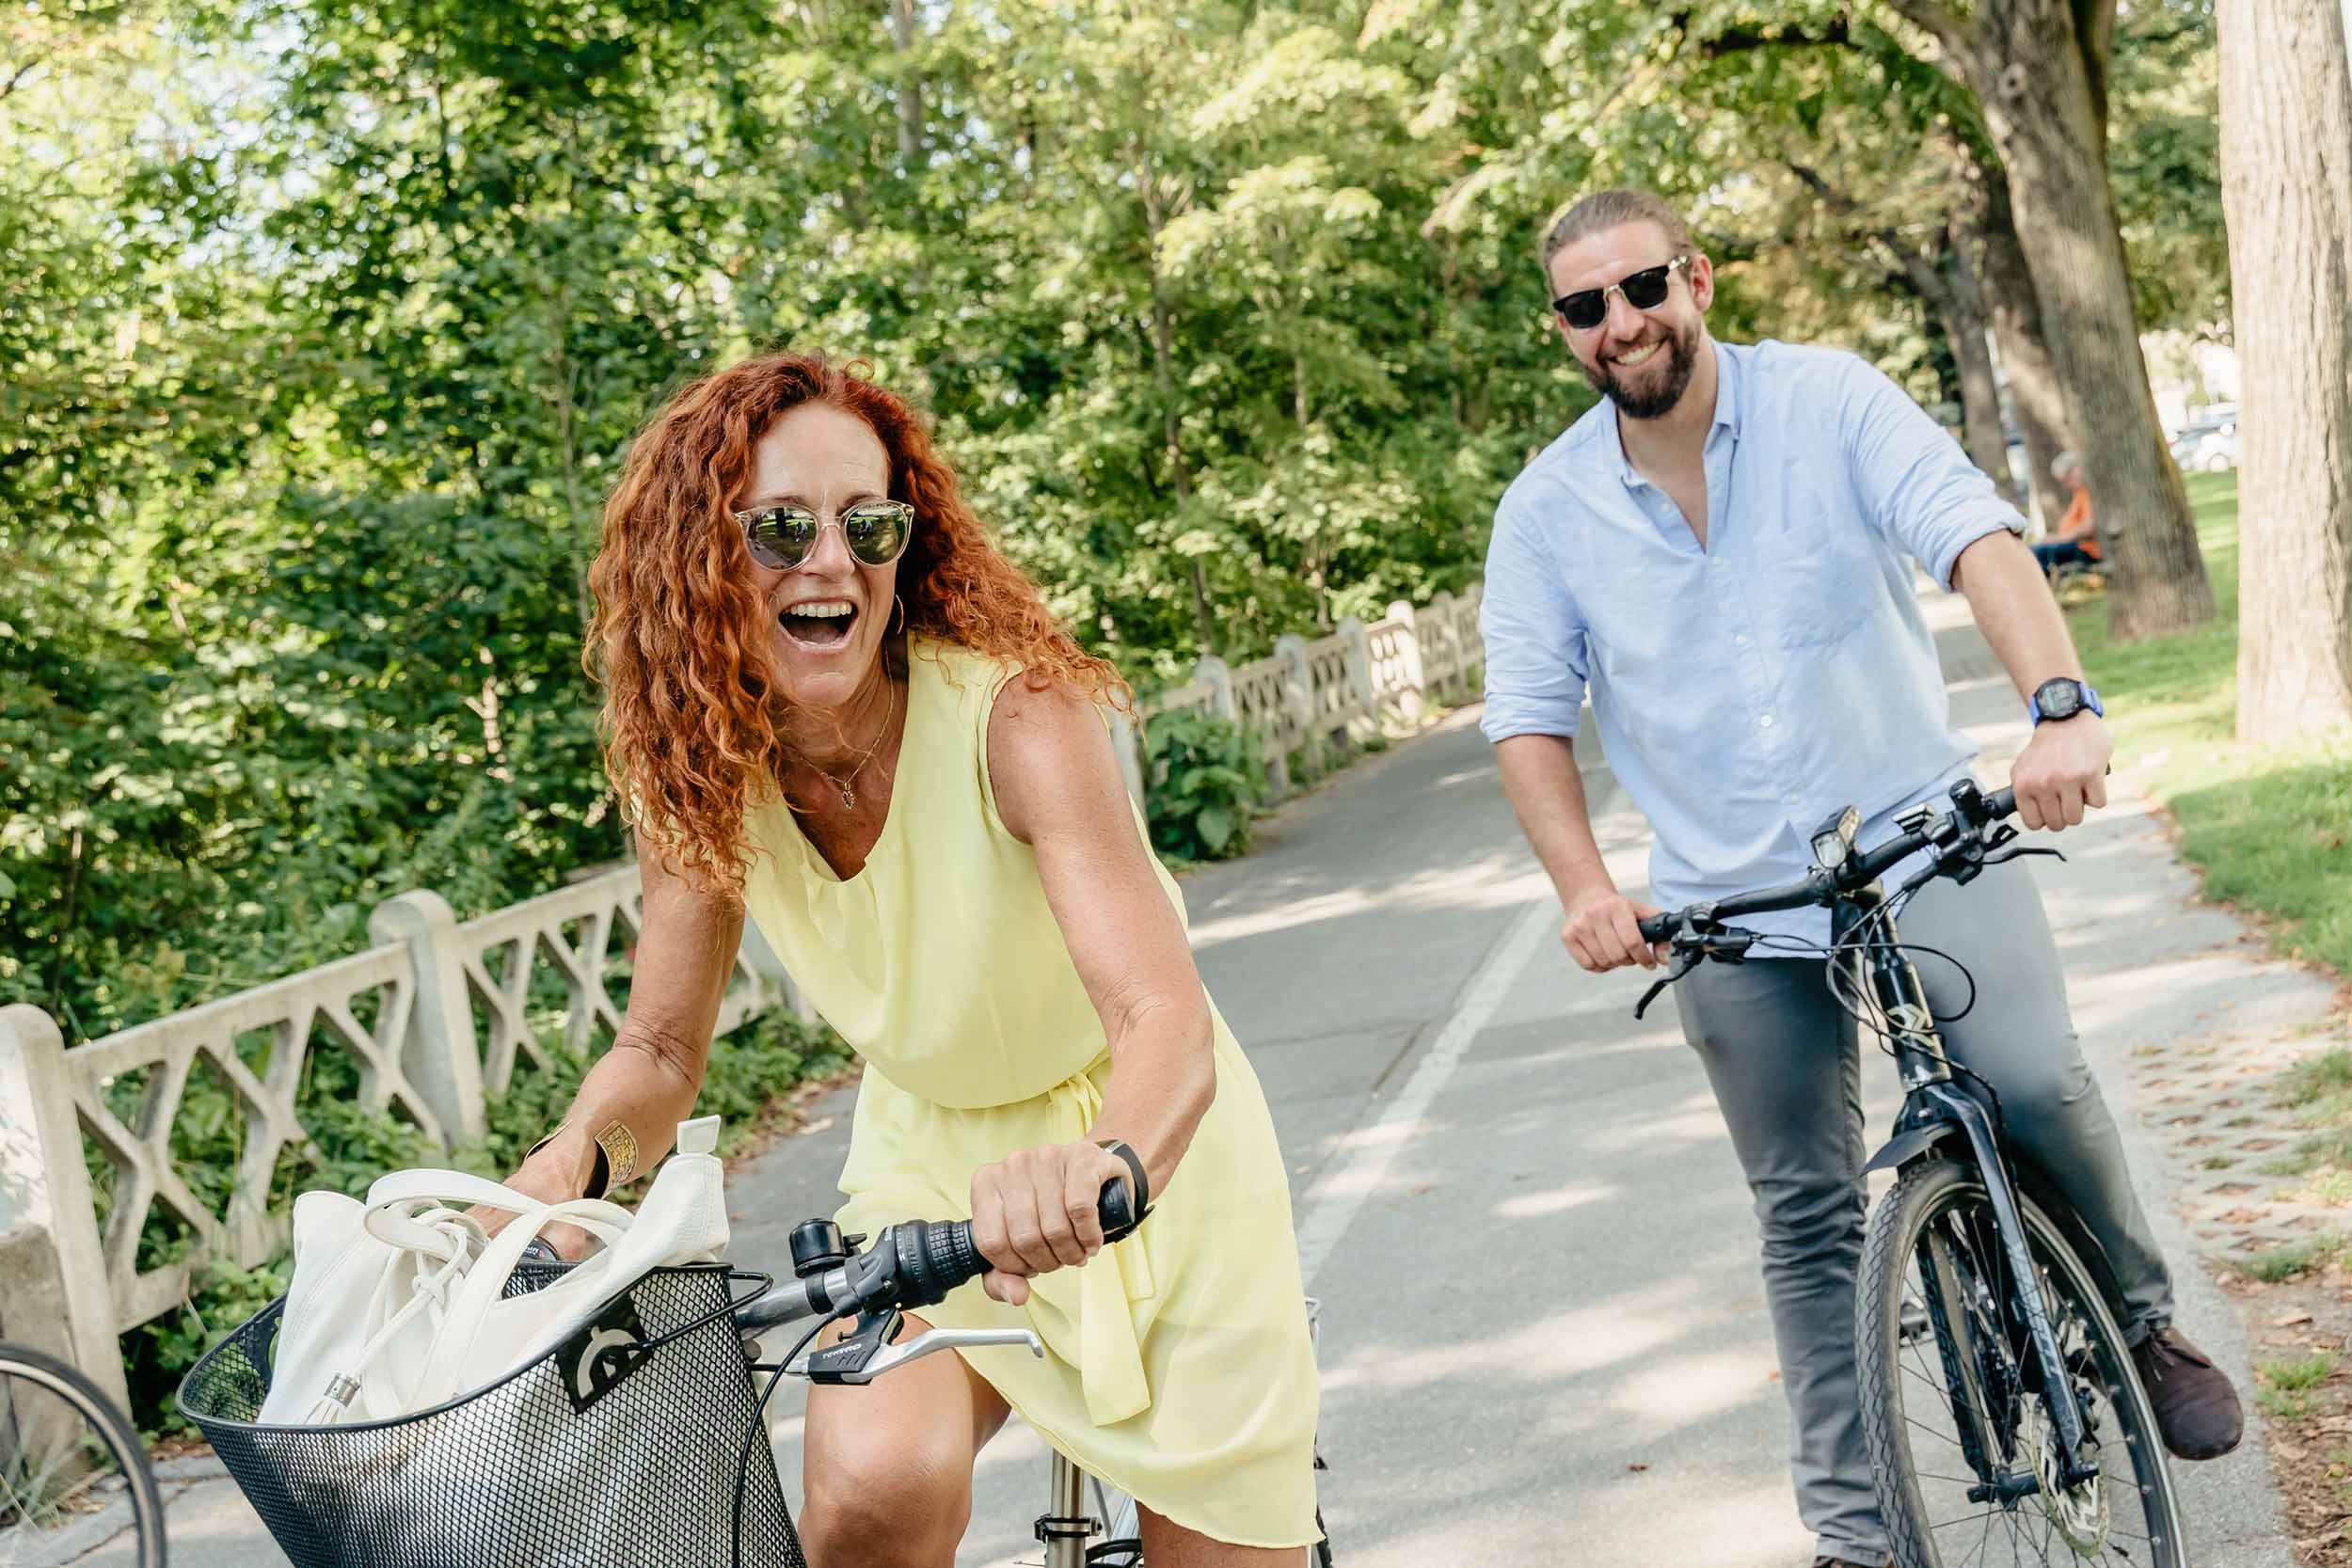 Mann und Frau auf Murradweg